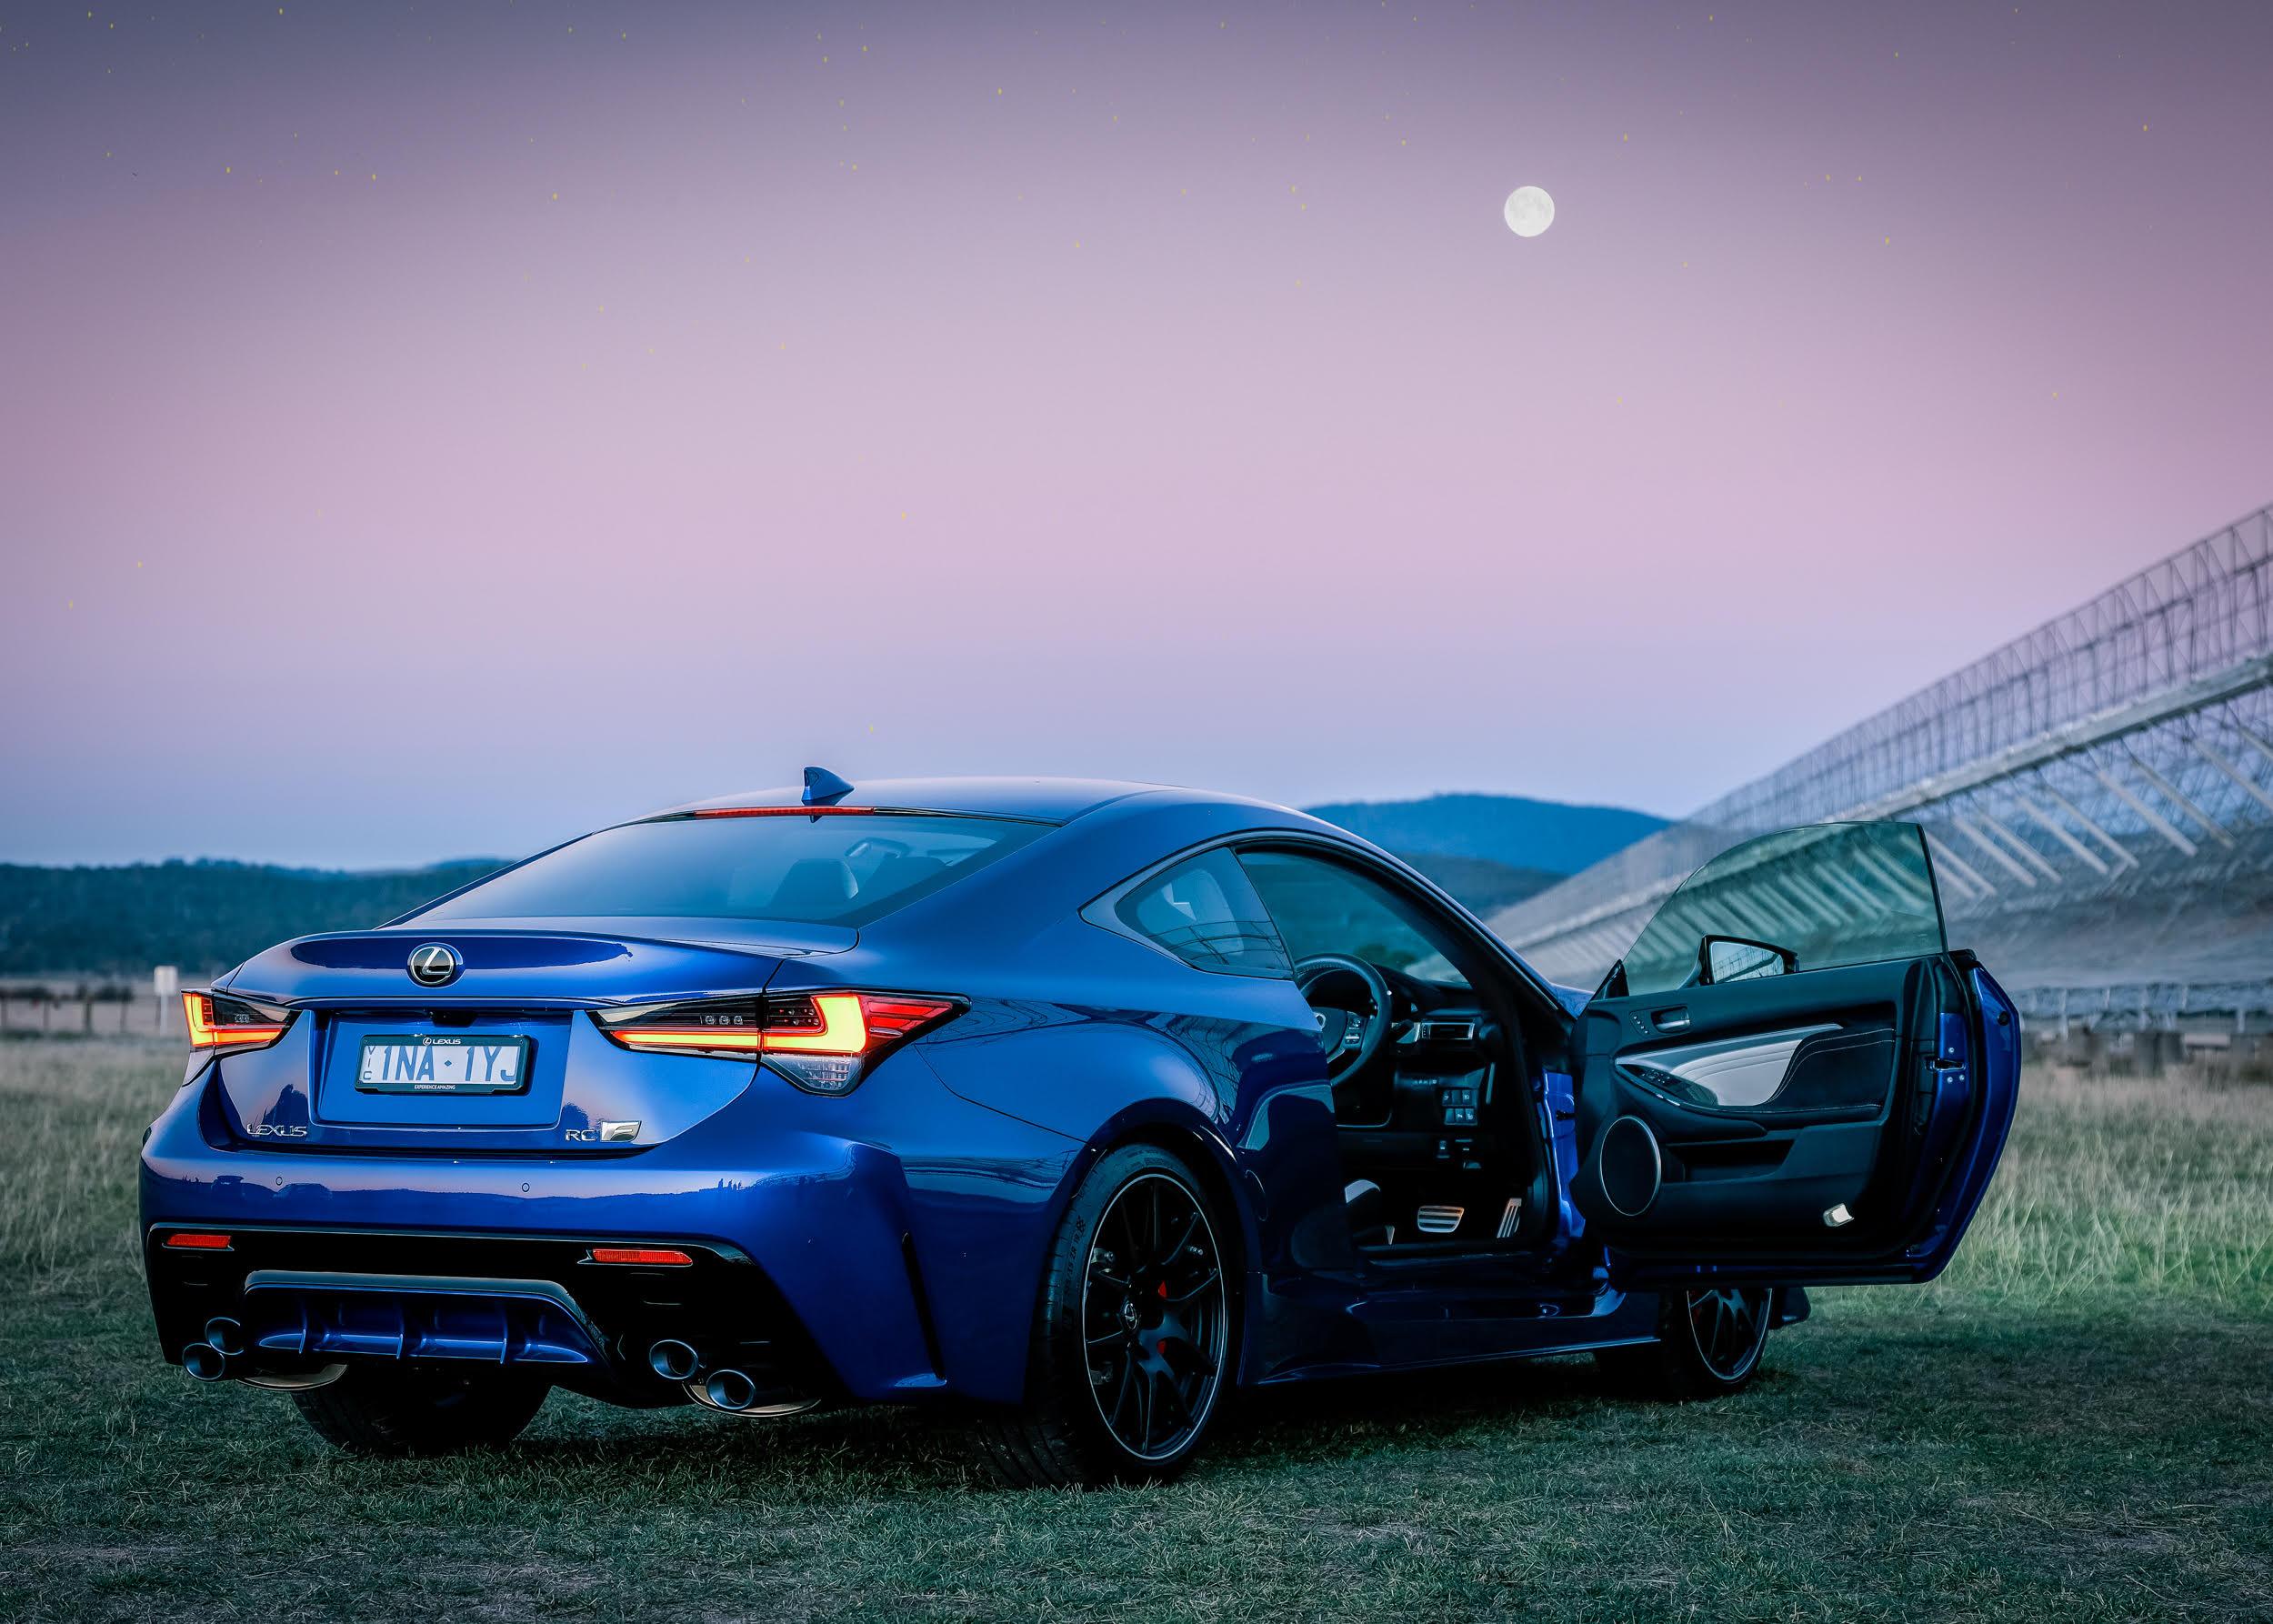 Lexus sends a test drive invite into space in Men In Black campaign via M&C Saatchi Melbourne